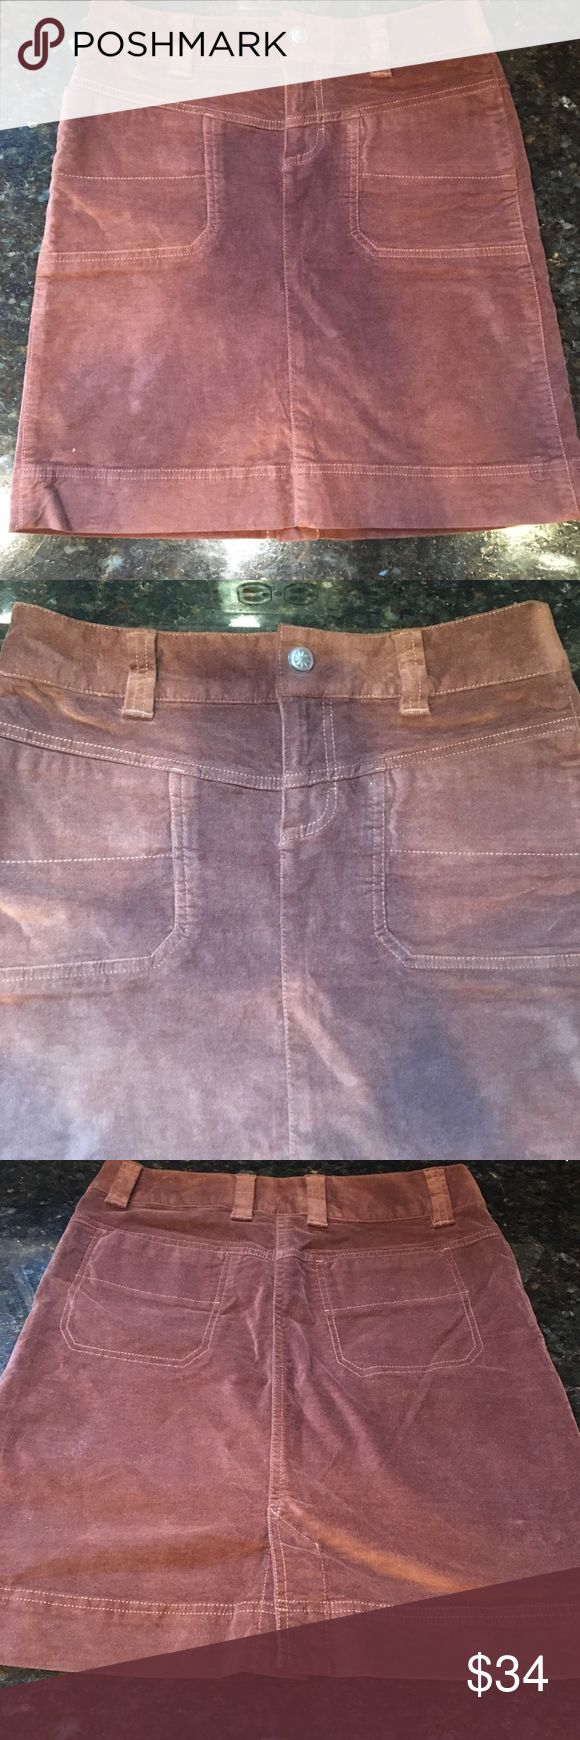 "ATHLETA Chocolate Brown Cotton Stretch Skirt 31"" waist 36"" hips 18"" Long  98% cotton, 2% spandex Athleta Skirts Mini"